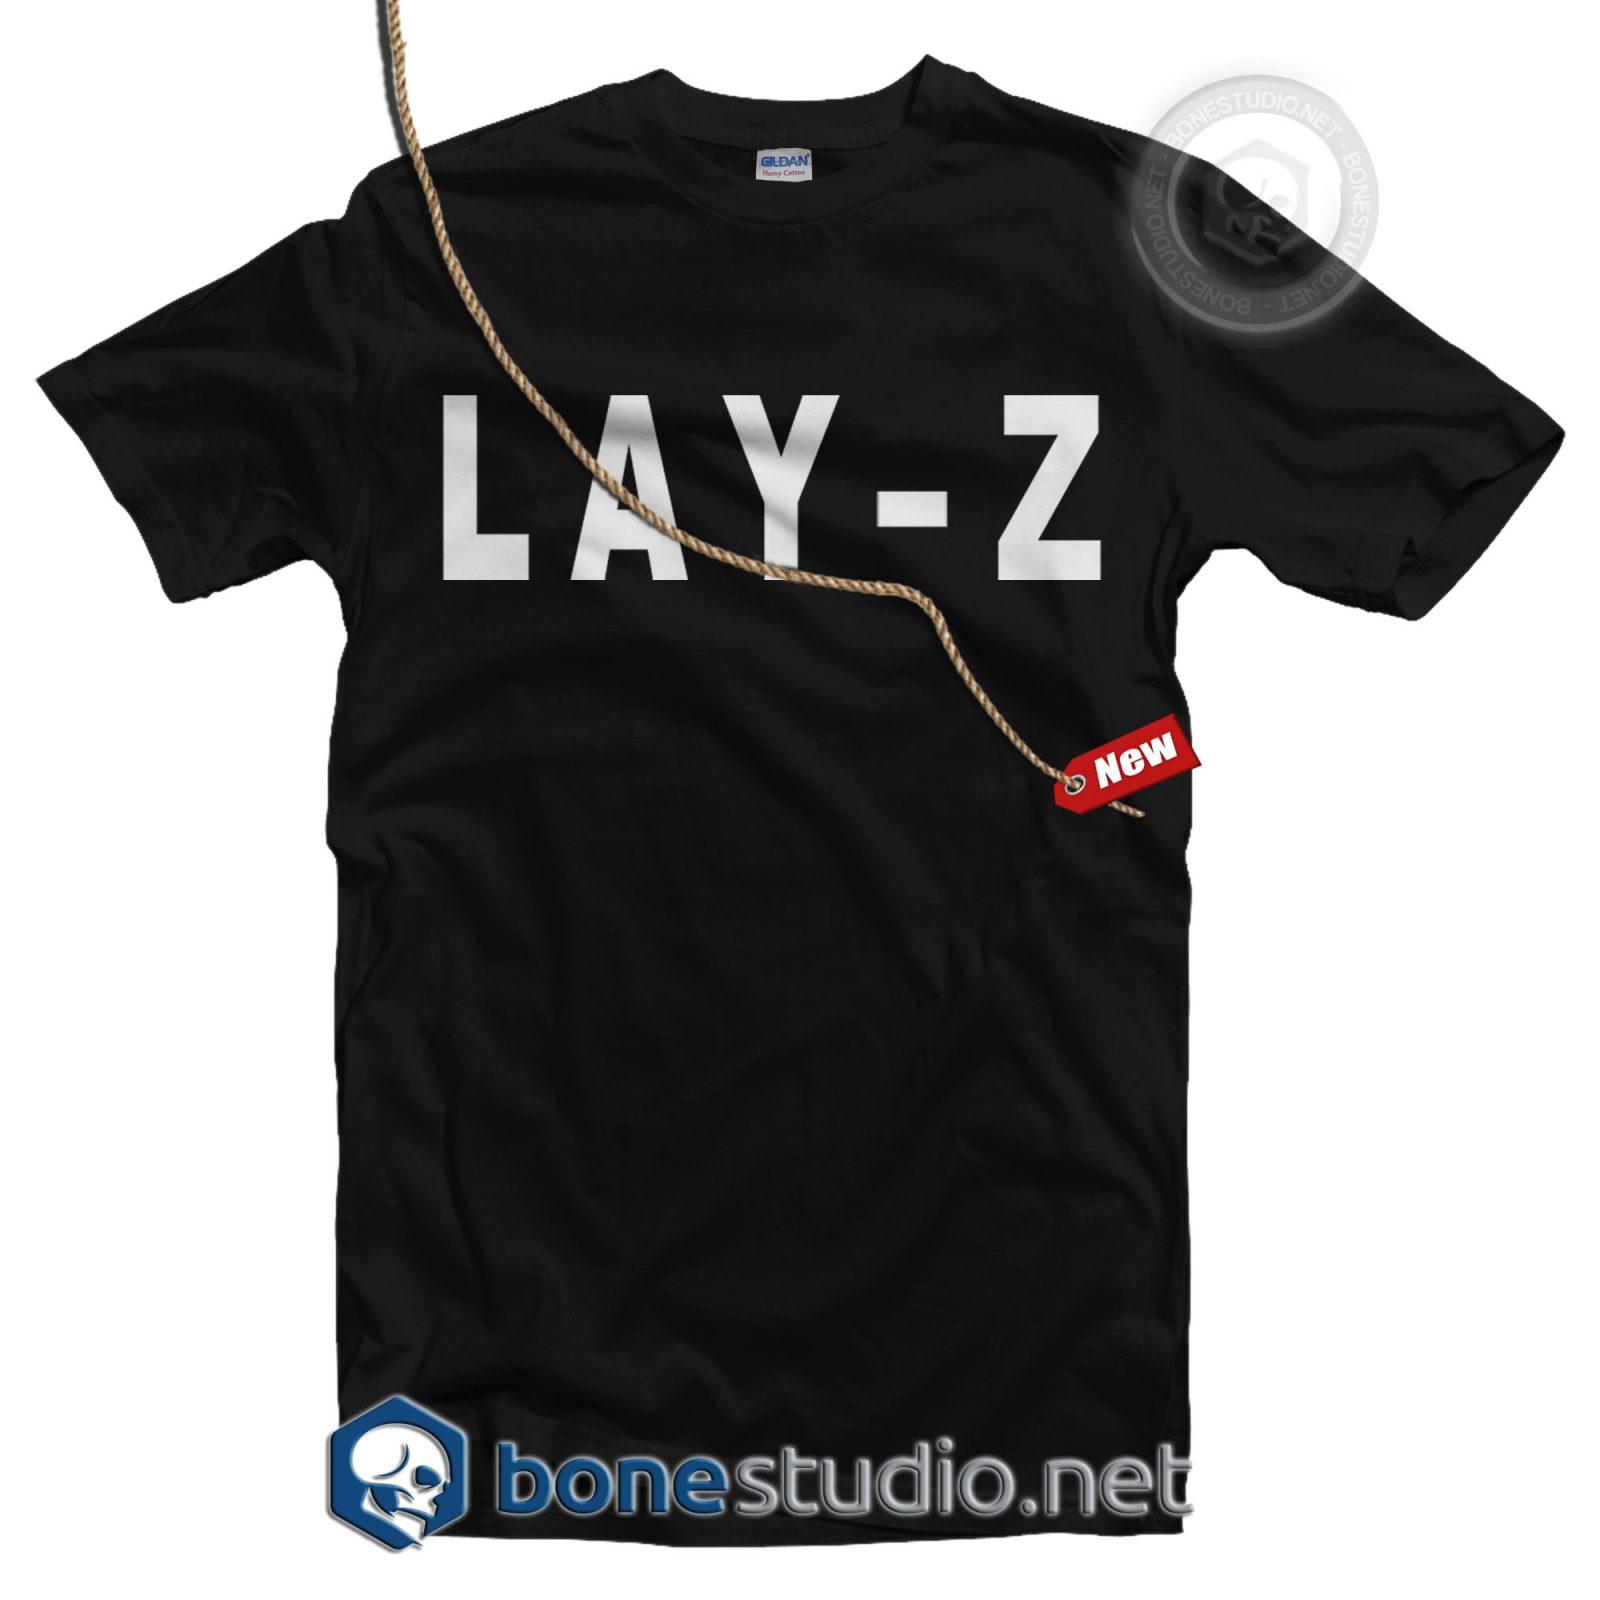 LAY Z T Shirt